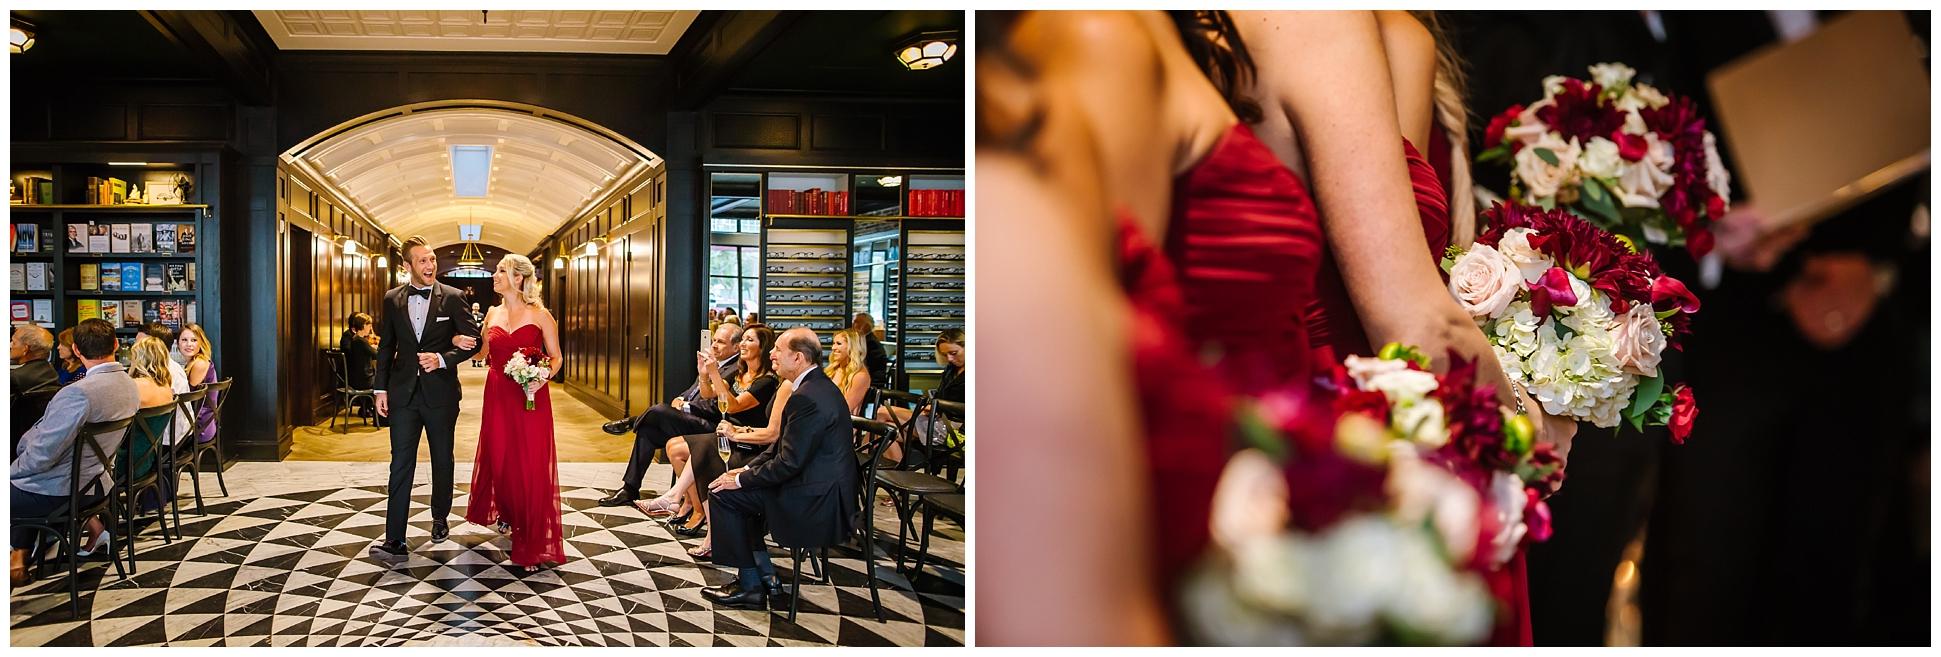 Oxford-exchange-wedding-photogapher-garland-candels-bookstore-burgandy-botanica_0045.jpg